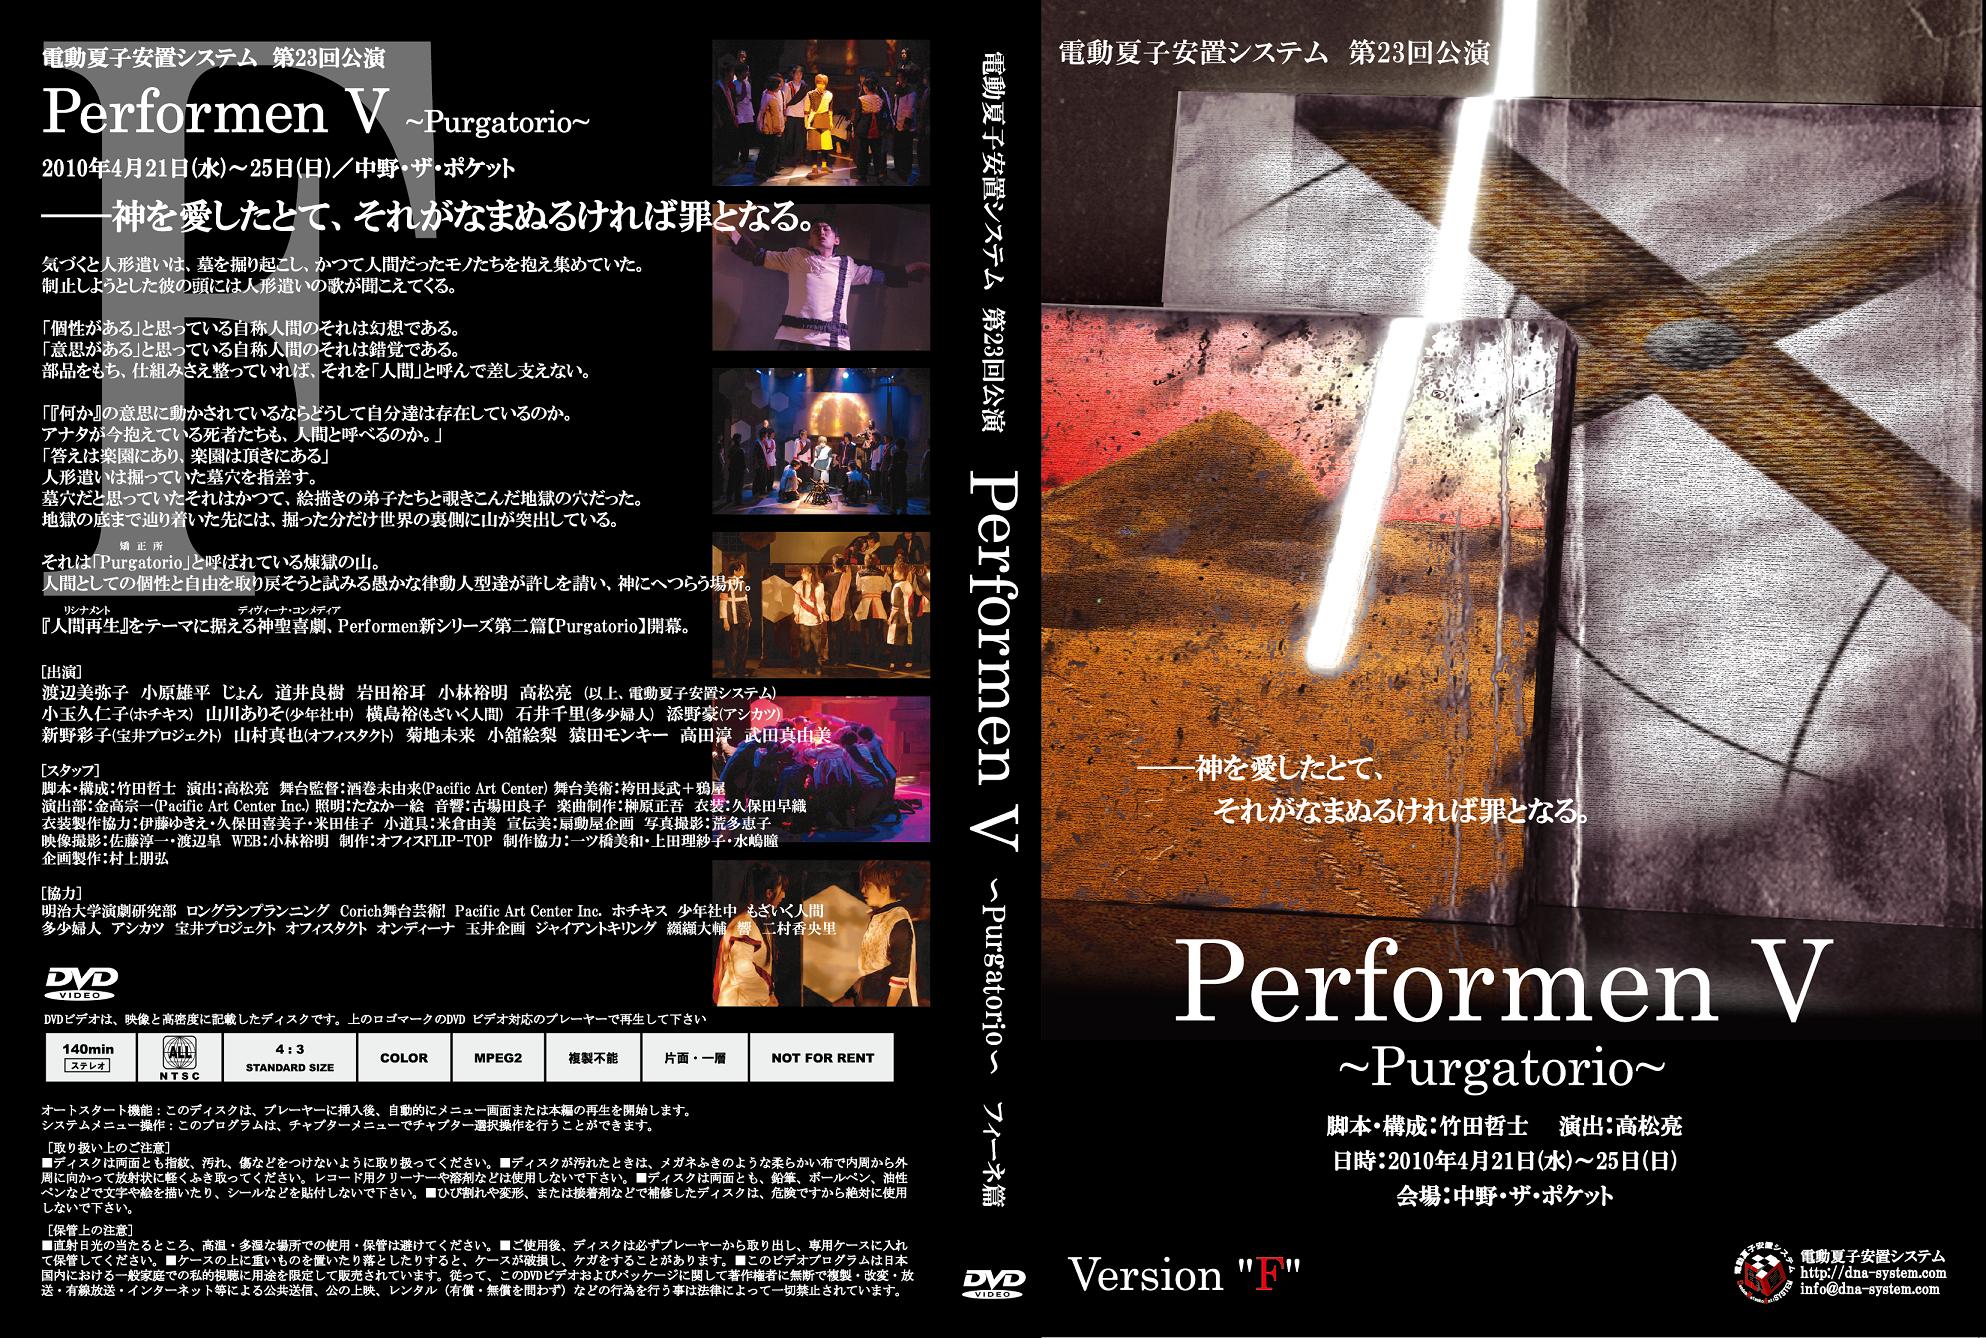 DVD 第23回公演『PerformenV~Purgatorio~』(フィーネ編)